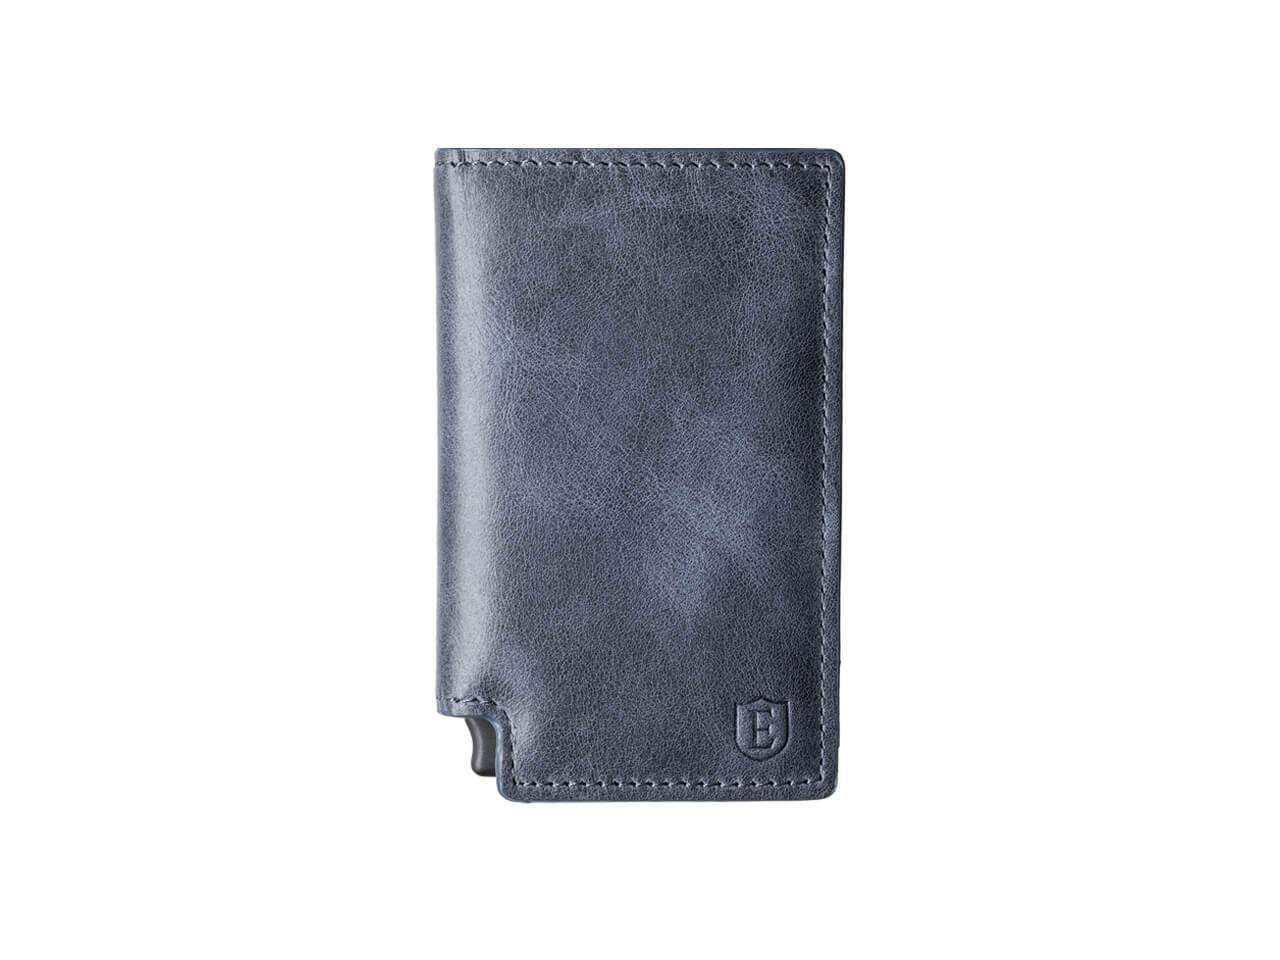 Ekster カードケース+マネークリップ Parliament Wallet B0733MJK7P 15mm slim|スチールブルー スチールブルー 15mm slim